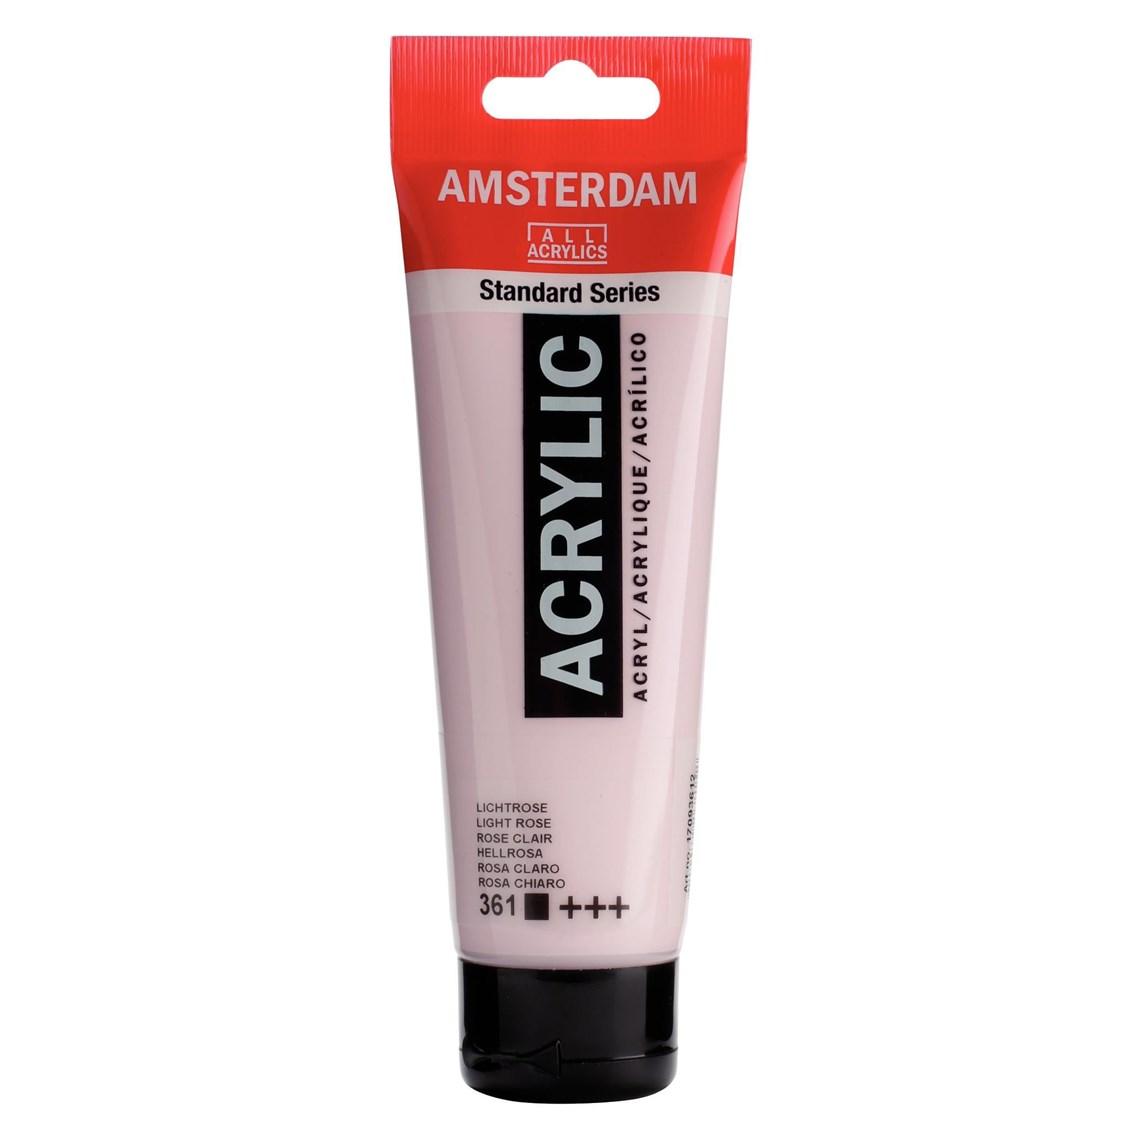 Amsterdam acrylverf Lichtroze 361 Angelart kunst en zo